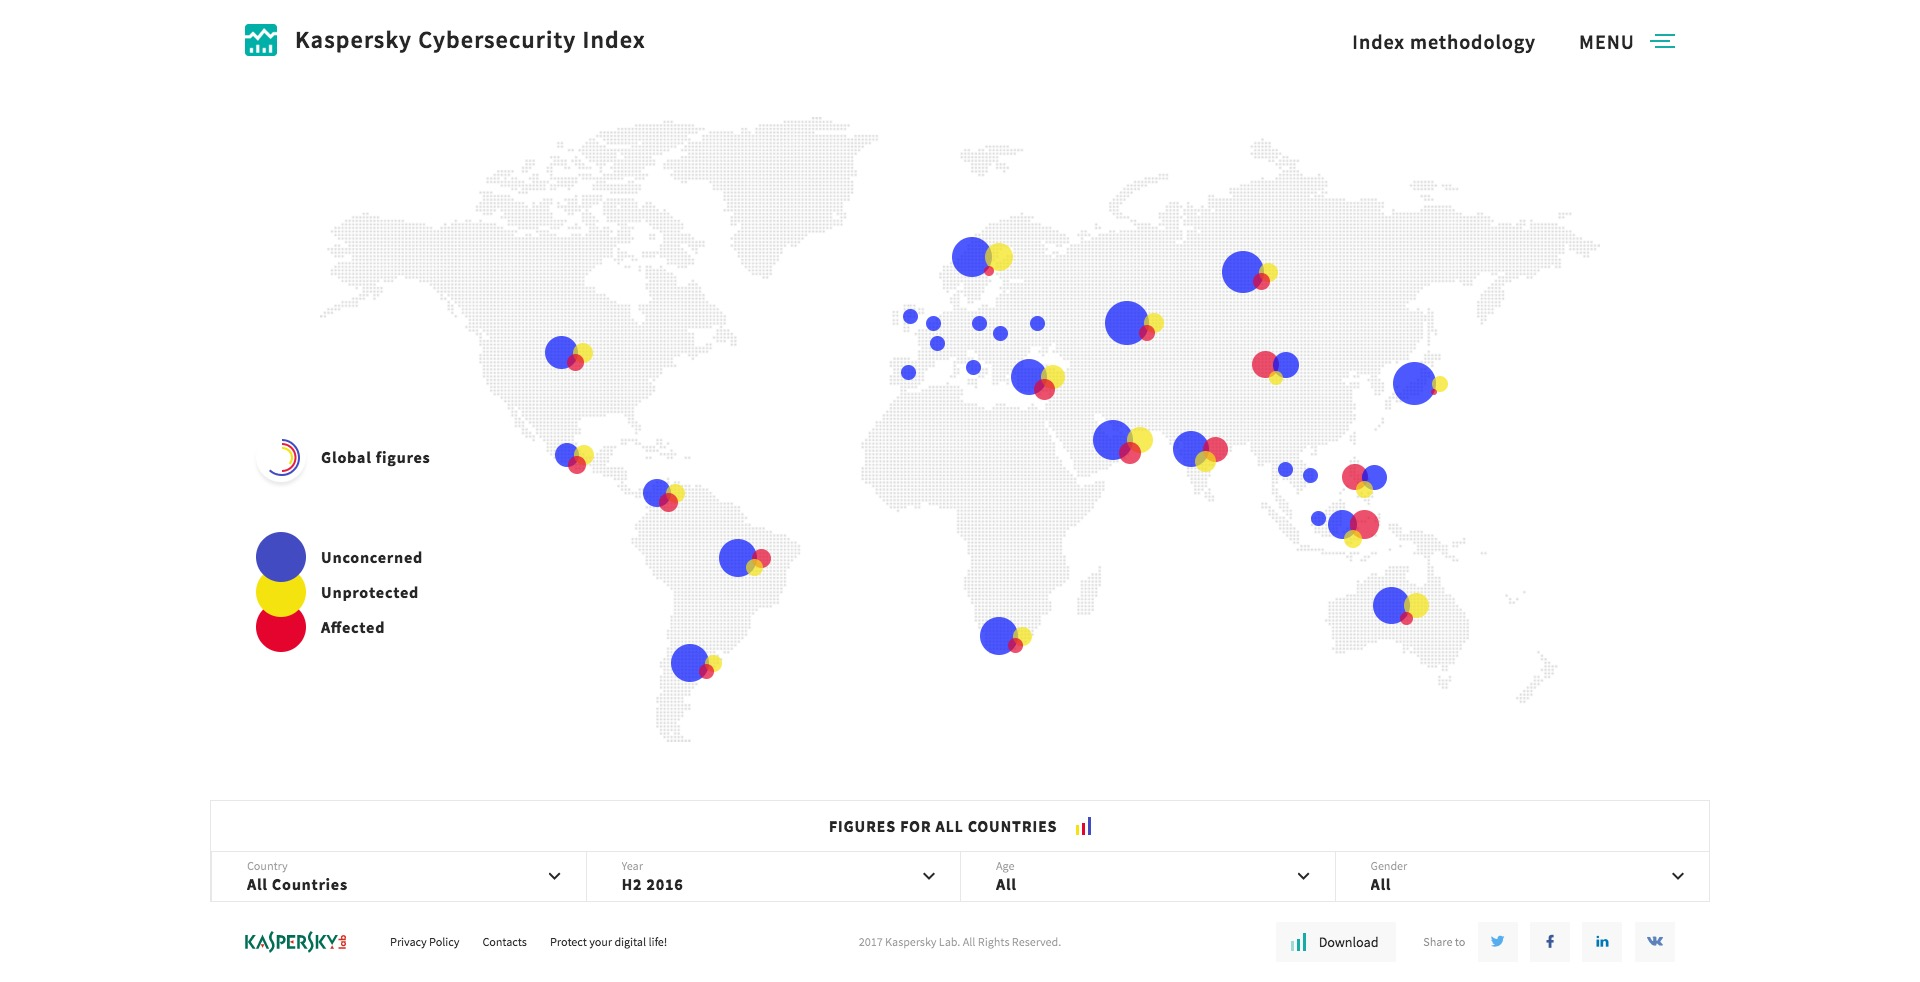 Kaspersky Cybersecurity Index